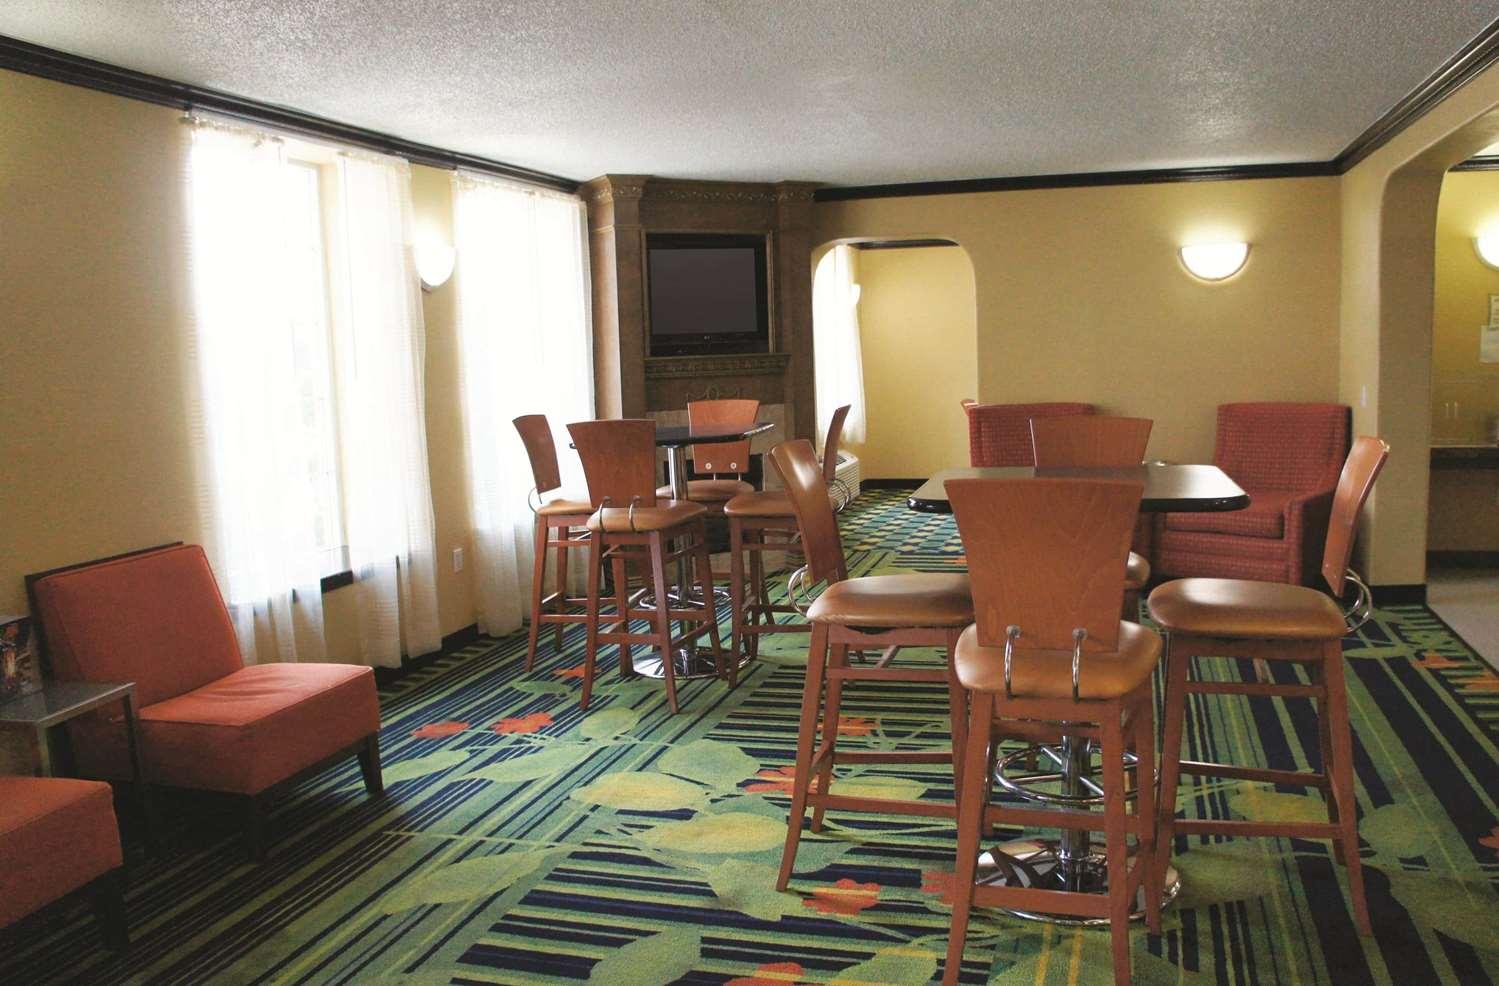 proam - La Quinta Inn & Suites Central Tulsa